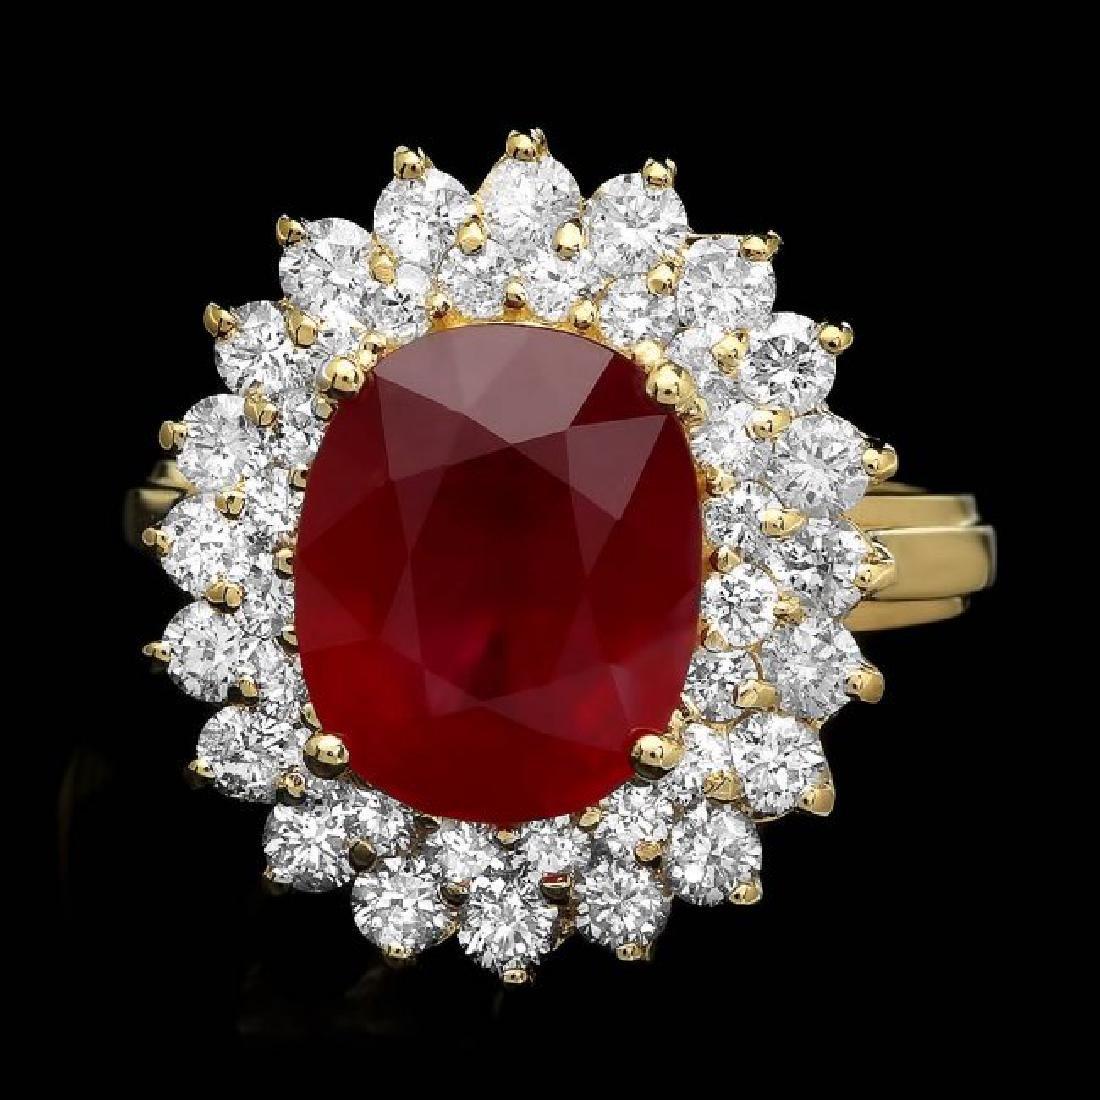 14k Yellow Gold 5.60ct Ruby 1.60ct Diamond Ring